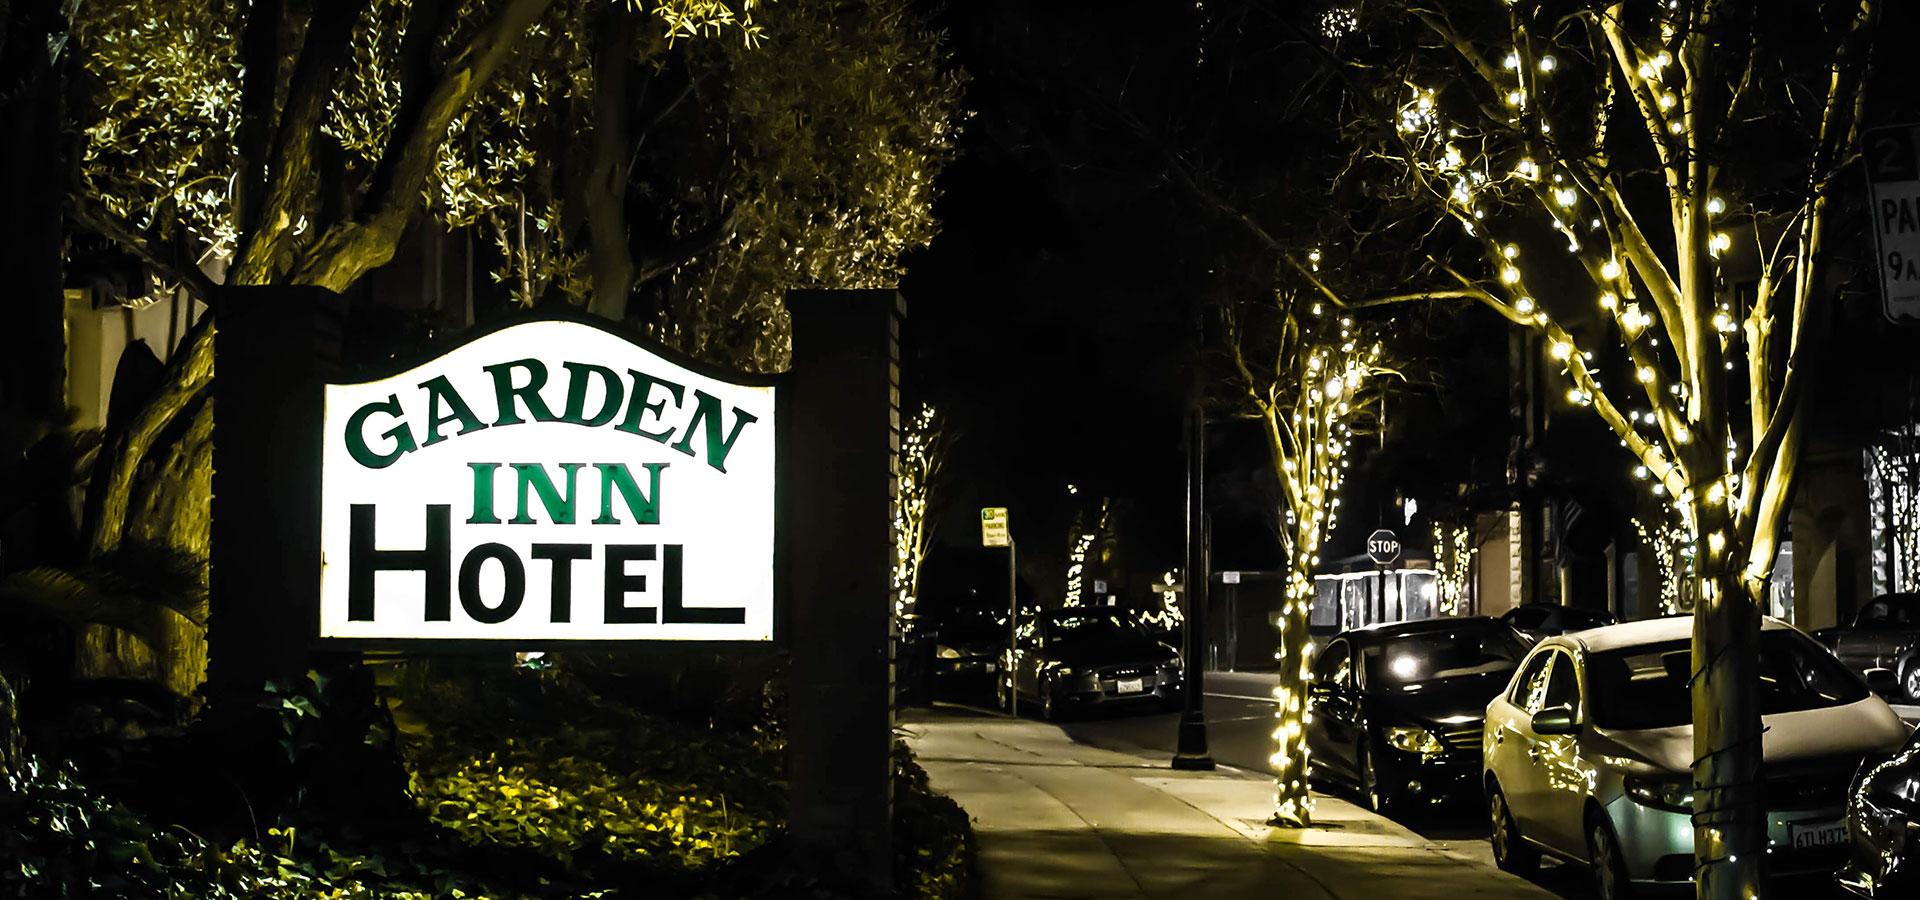 Los Gatos Hotel/Garden Inn Hotel